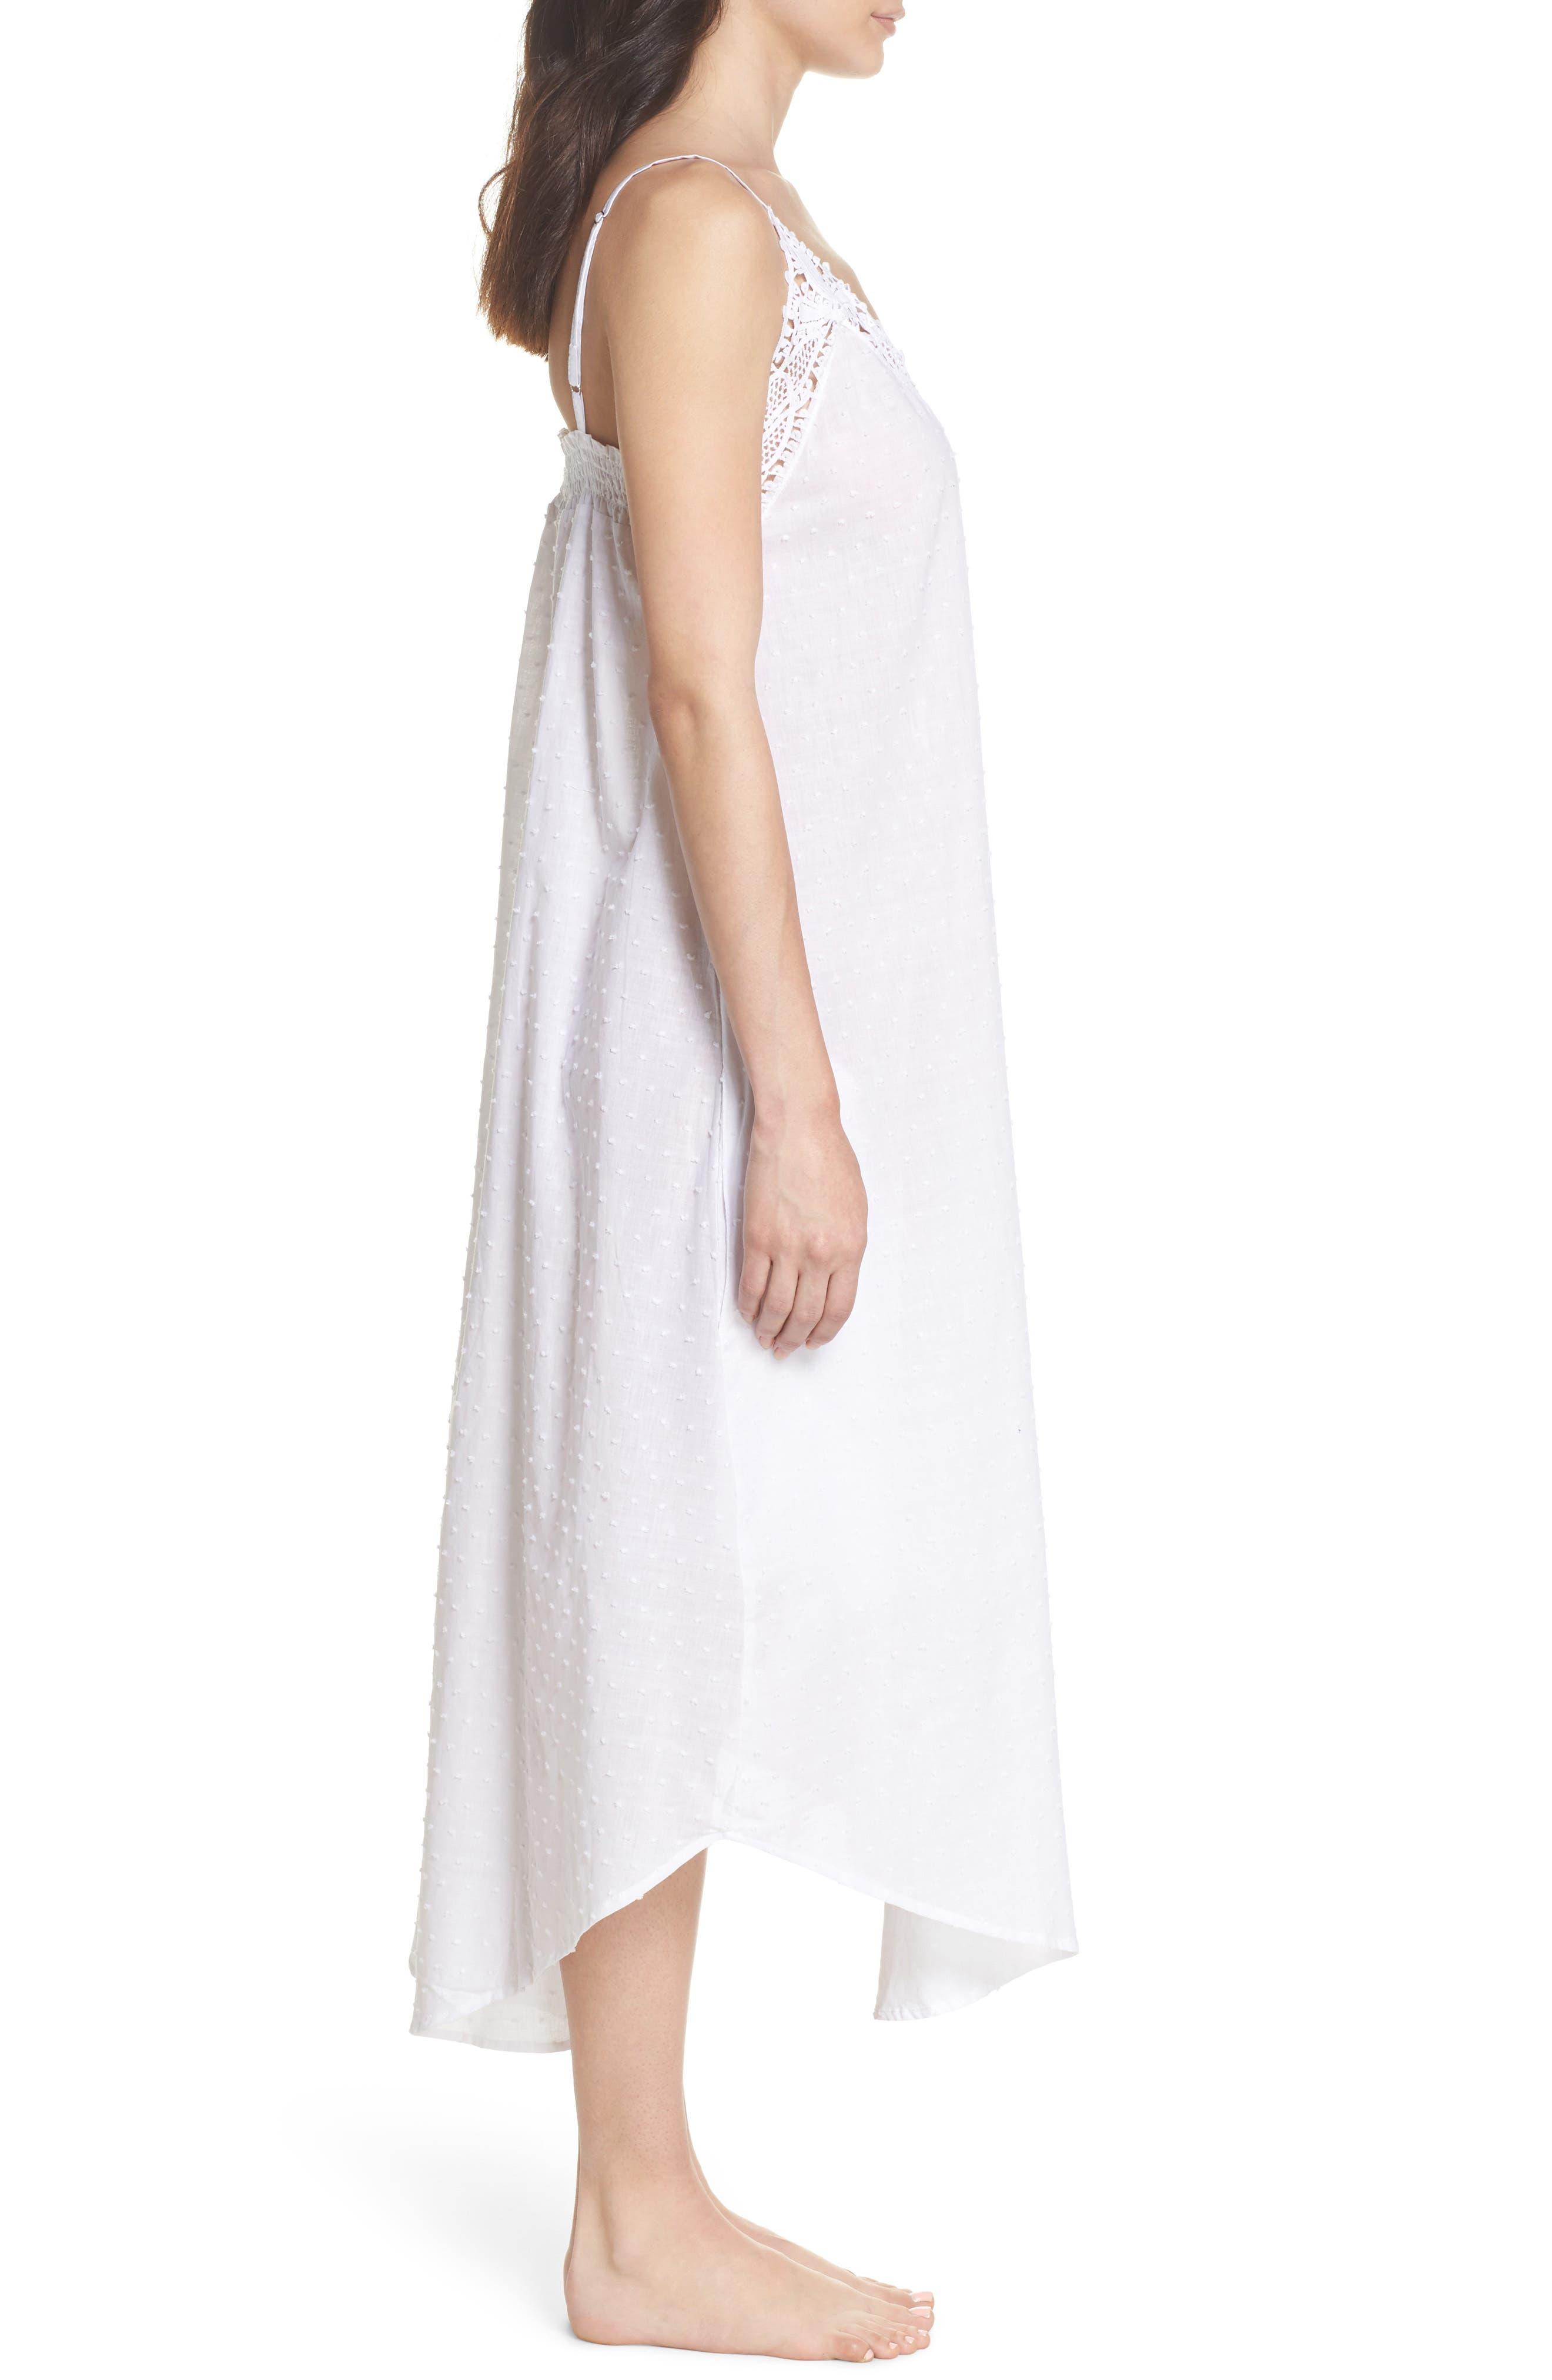 Swiss Dot Nightgown,                             Alternate thumbnail 3, color,                             White